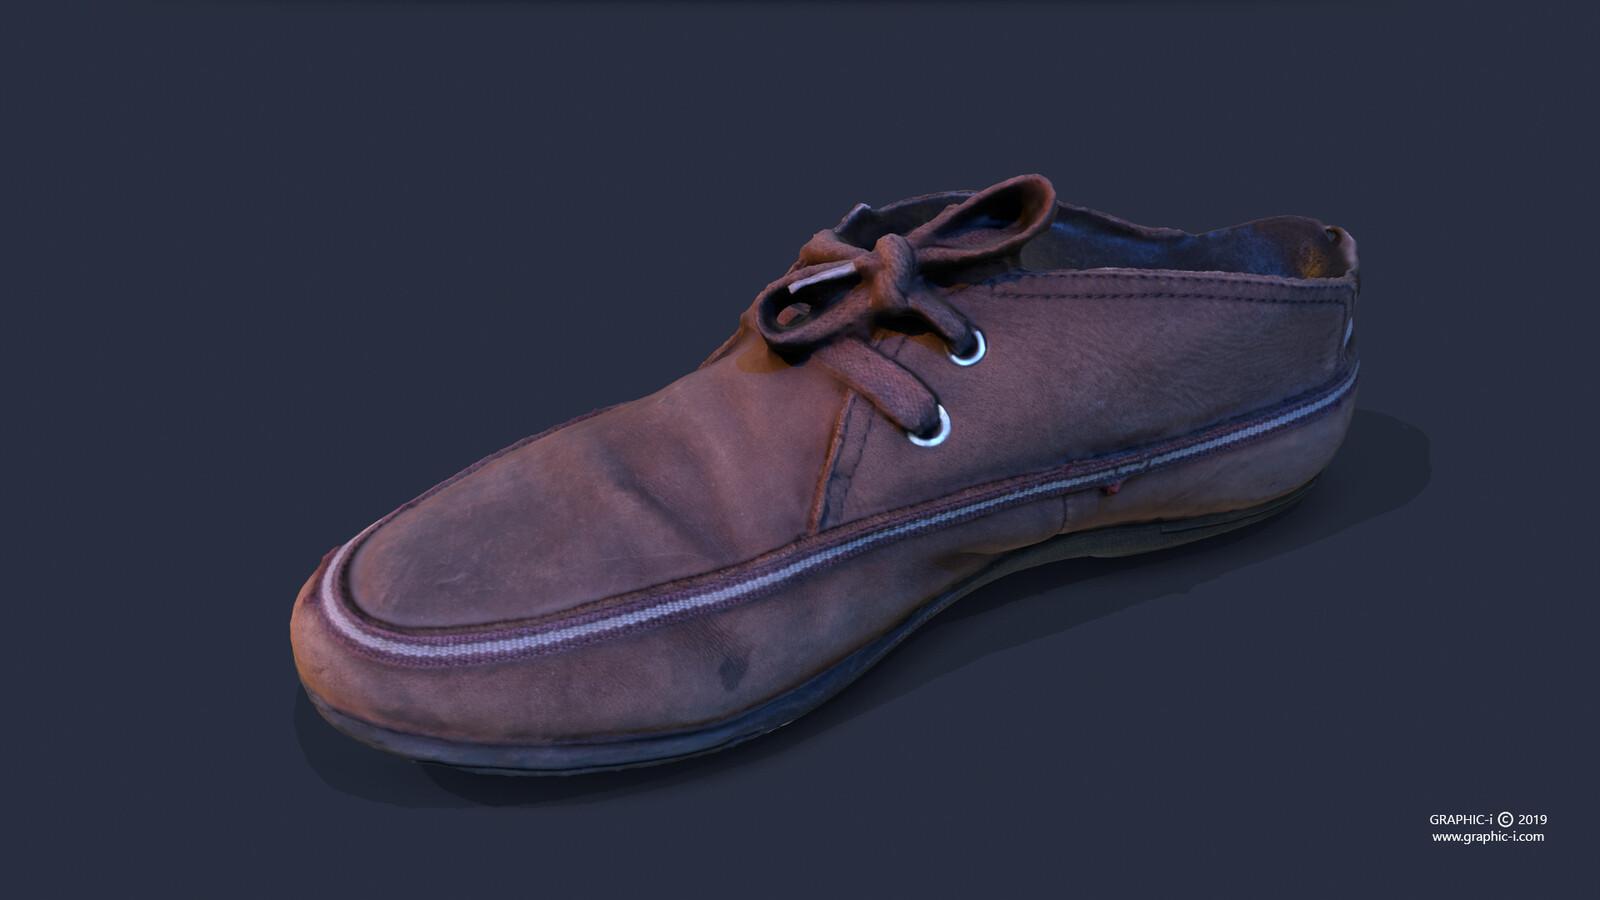 Realistic Shoe - 3D props